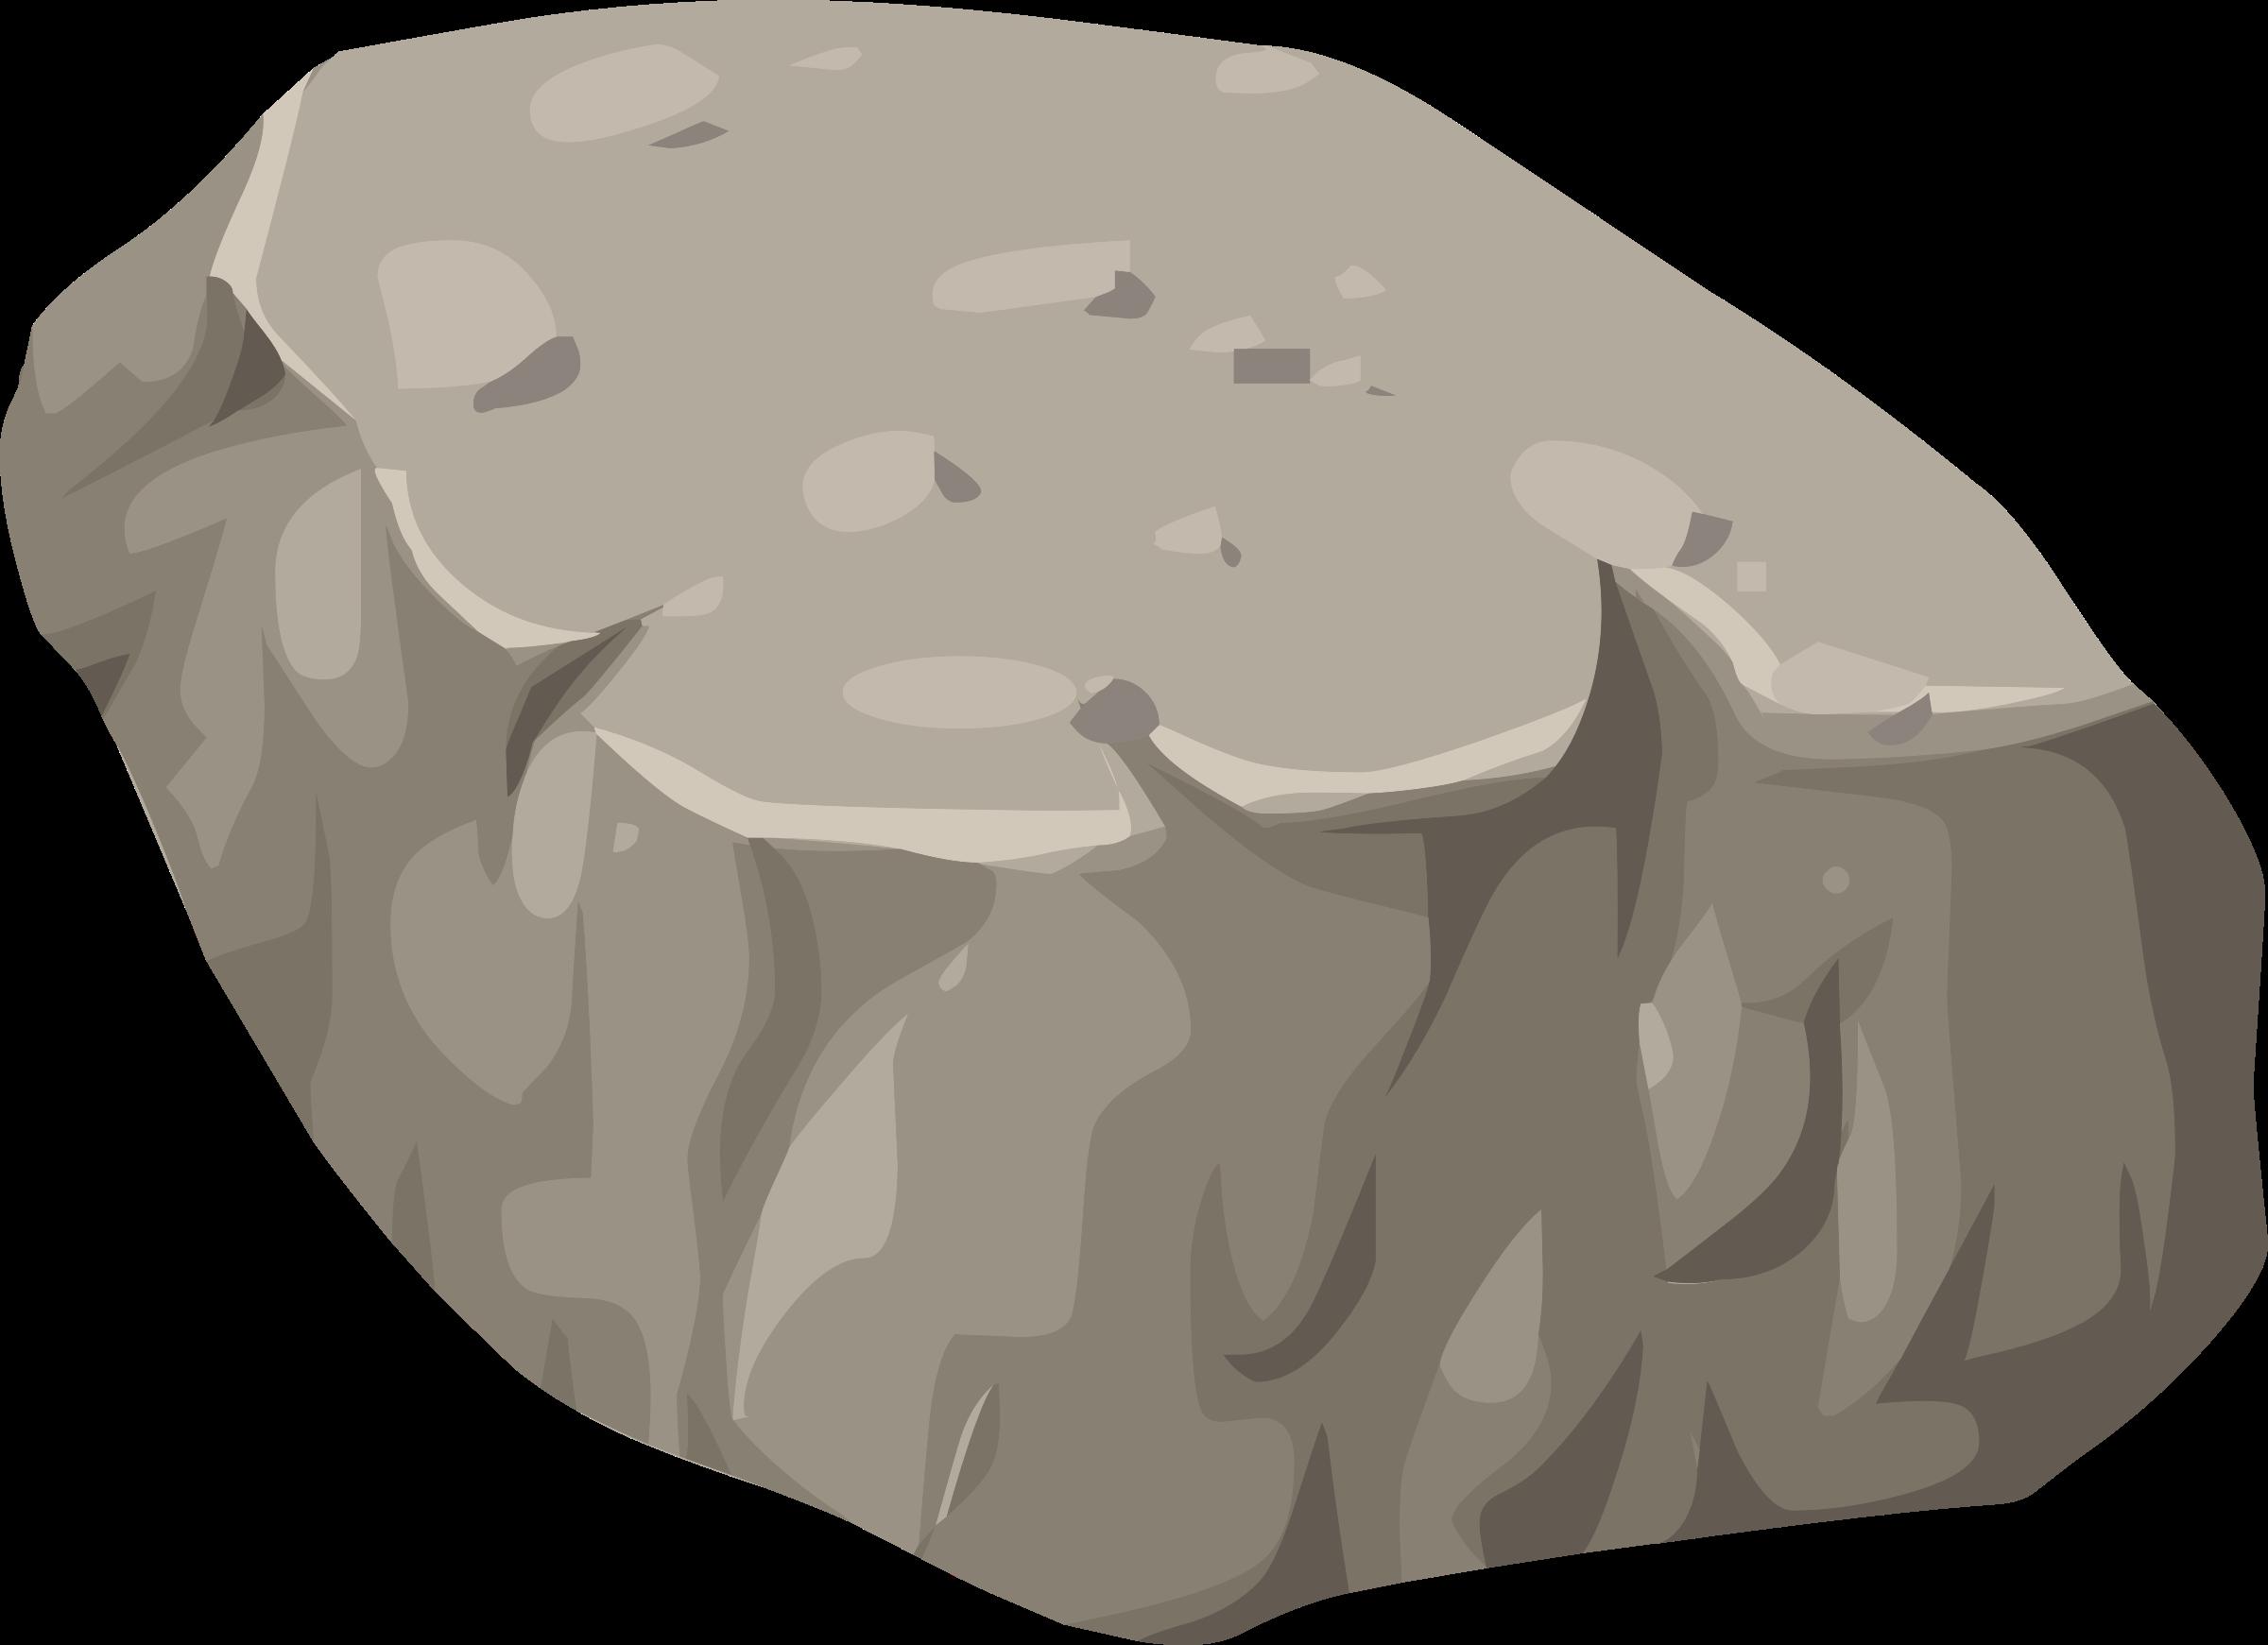 Rock clip art images free .-Rock clip art images free .-10